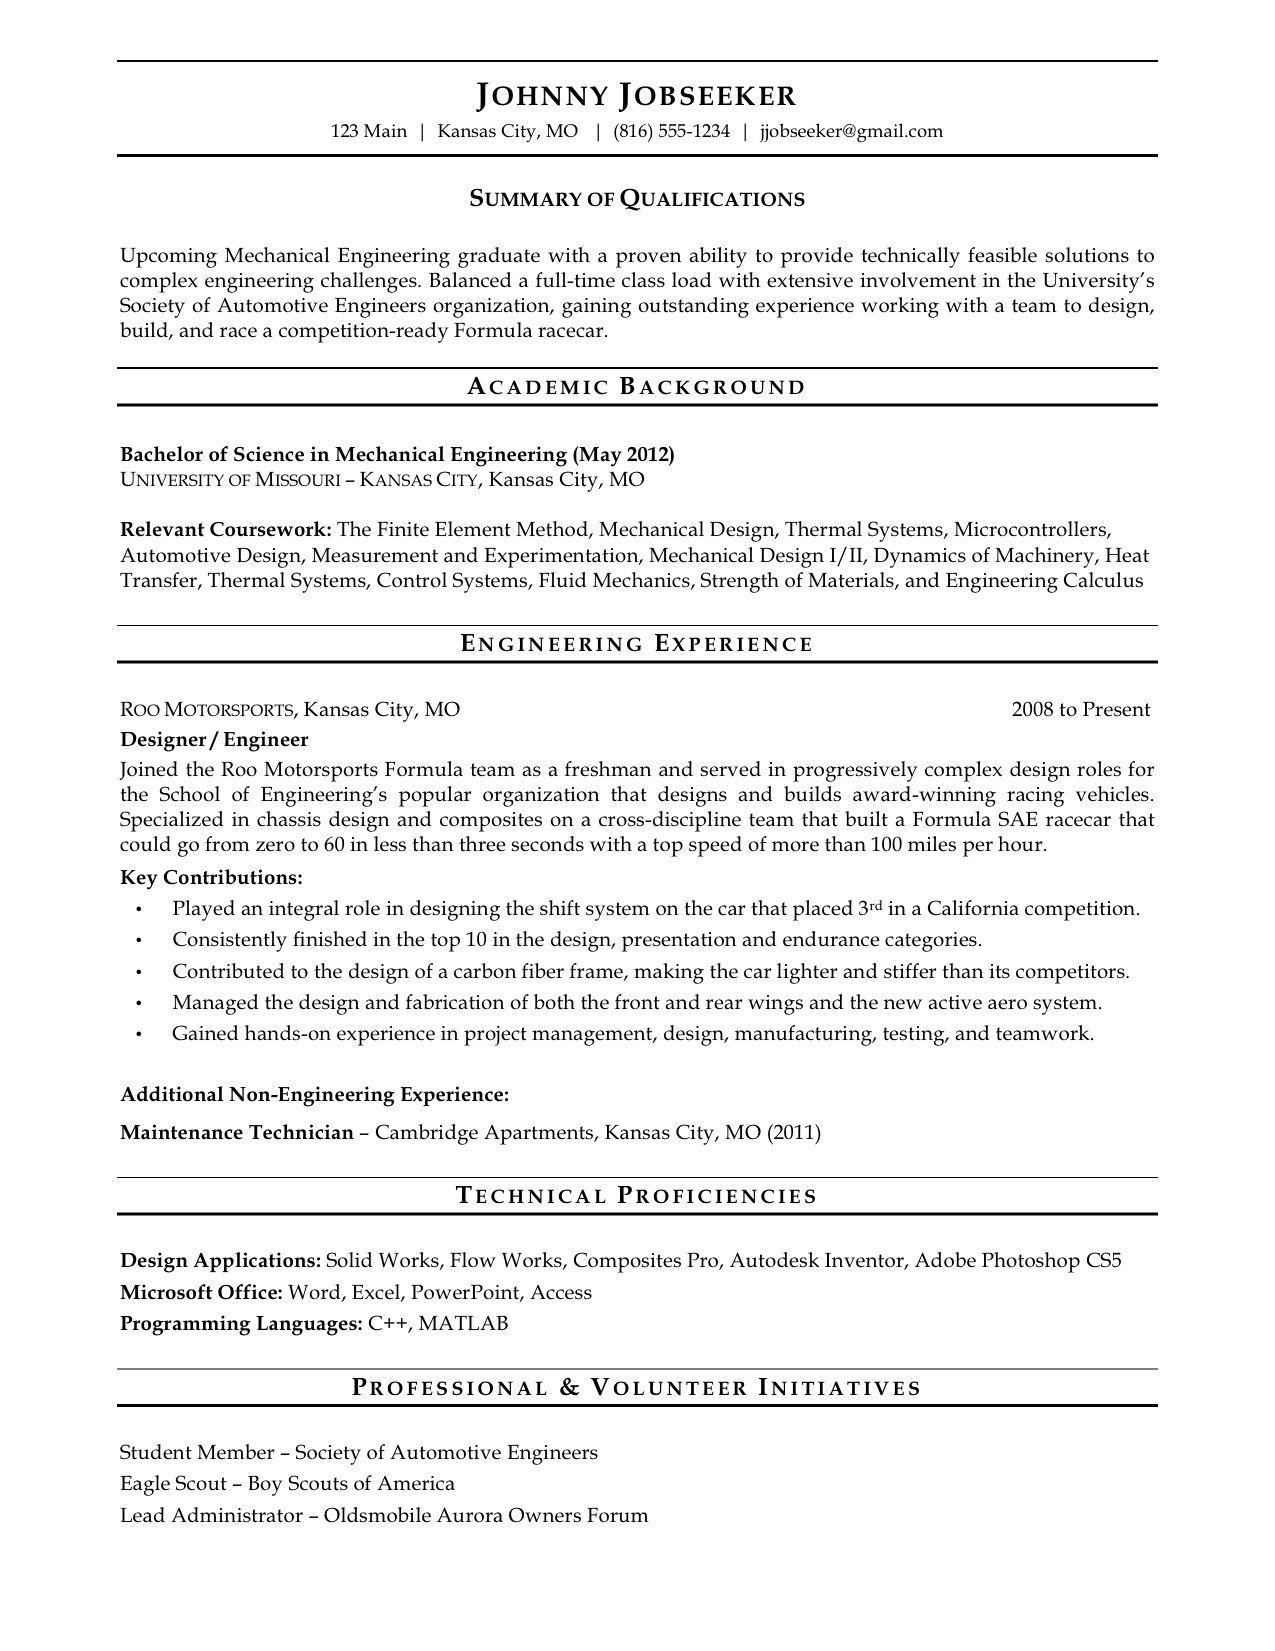 Executive Resume Writing Executive Resume Review Service Nursing Resume Resume Review Resume Writing Services